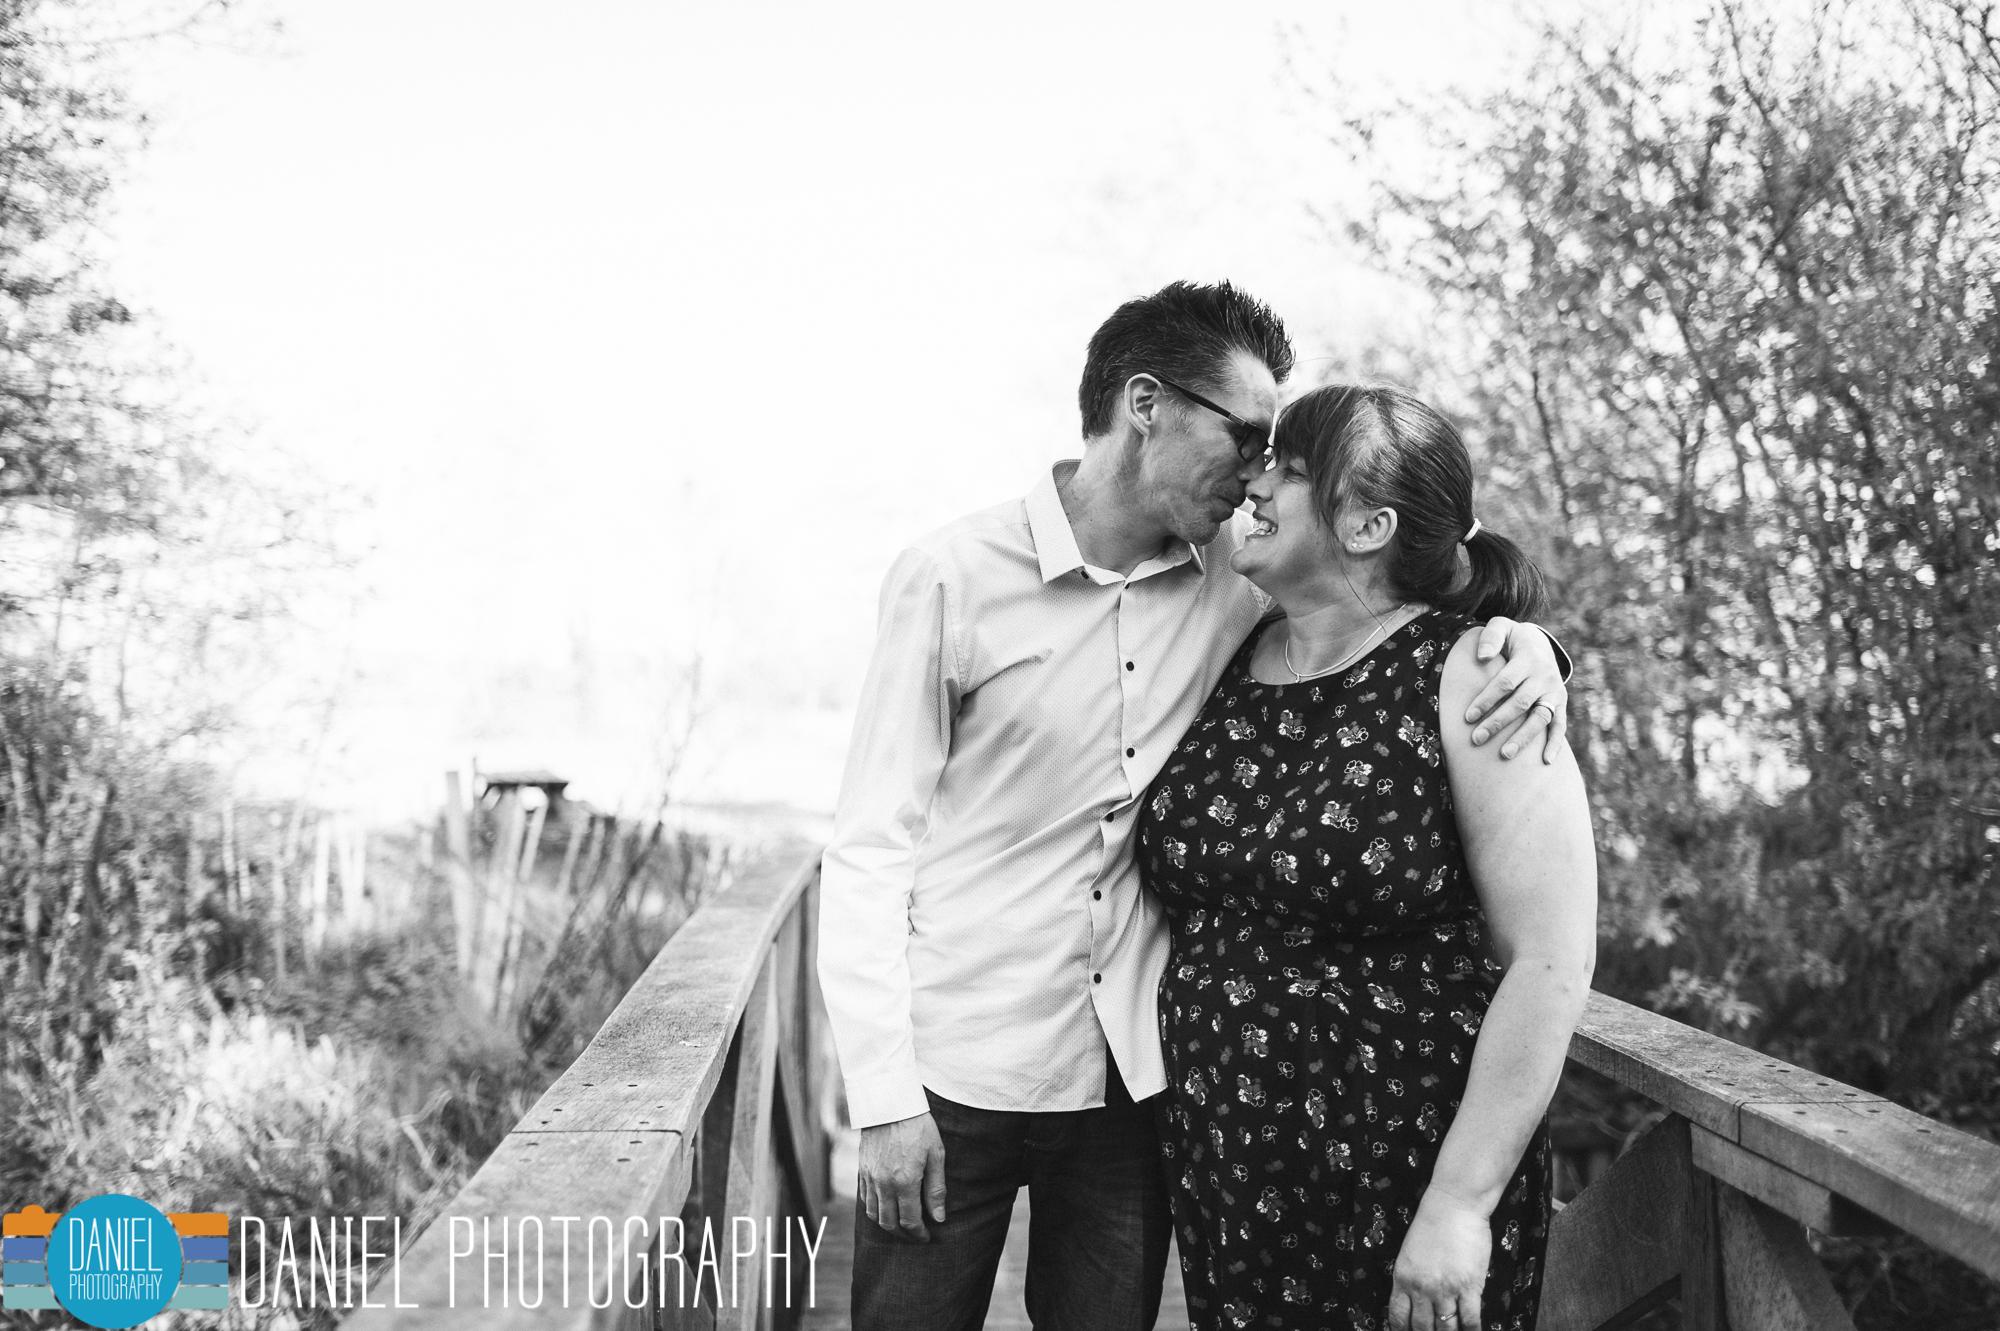 Sharon&Paul_Engagement_blog002.jpg